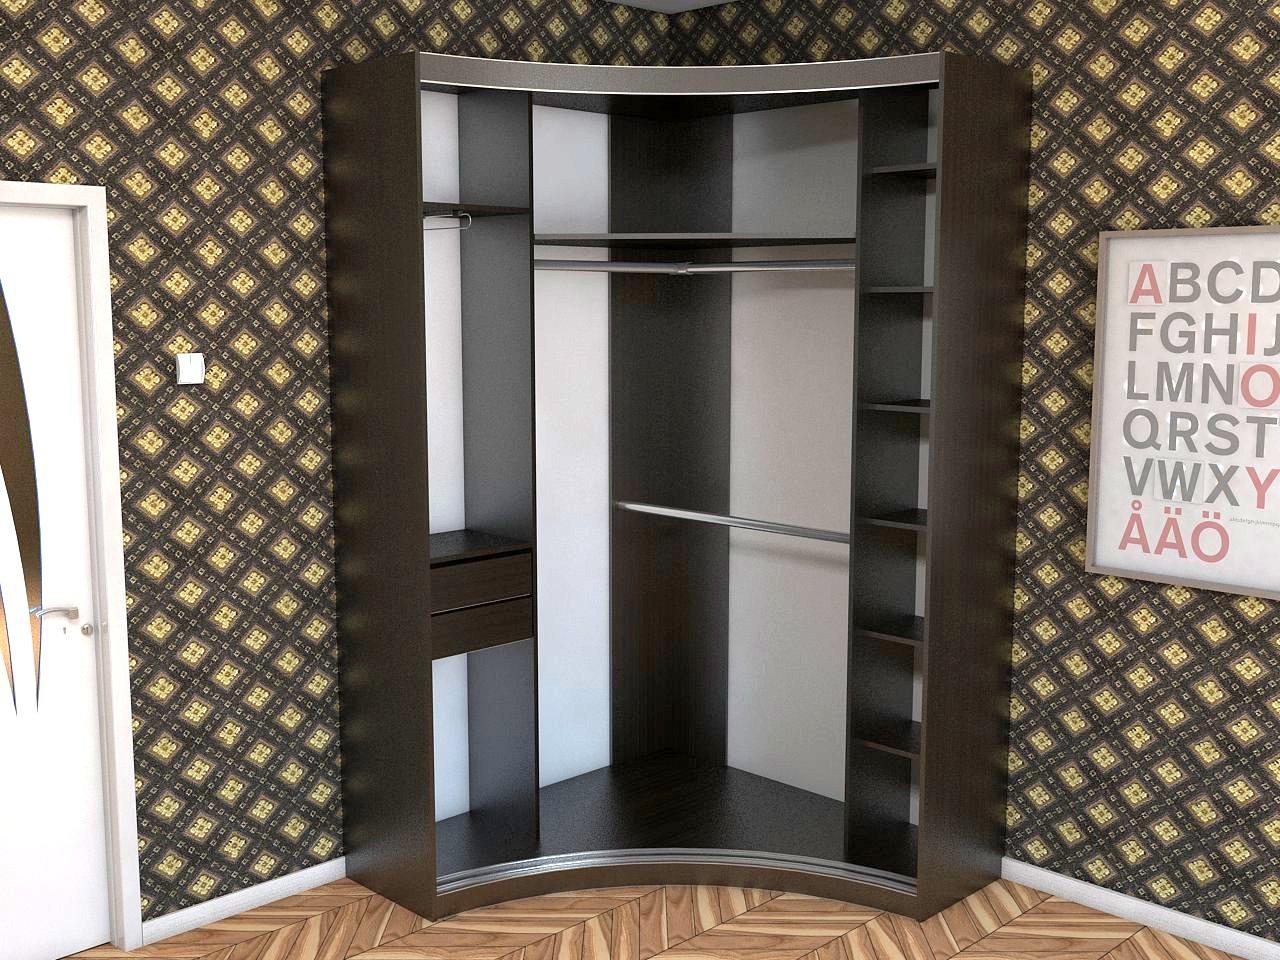 Угловые шкафы-купе готовые и под заказ от 3246 грн